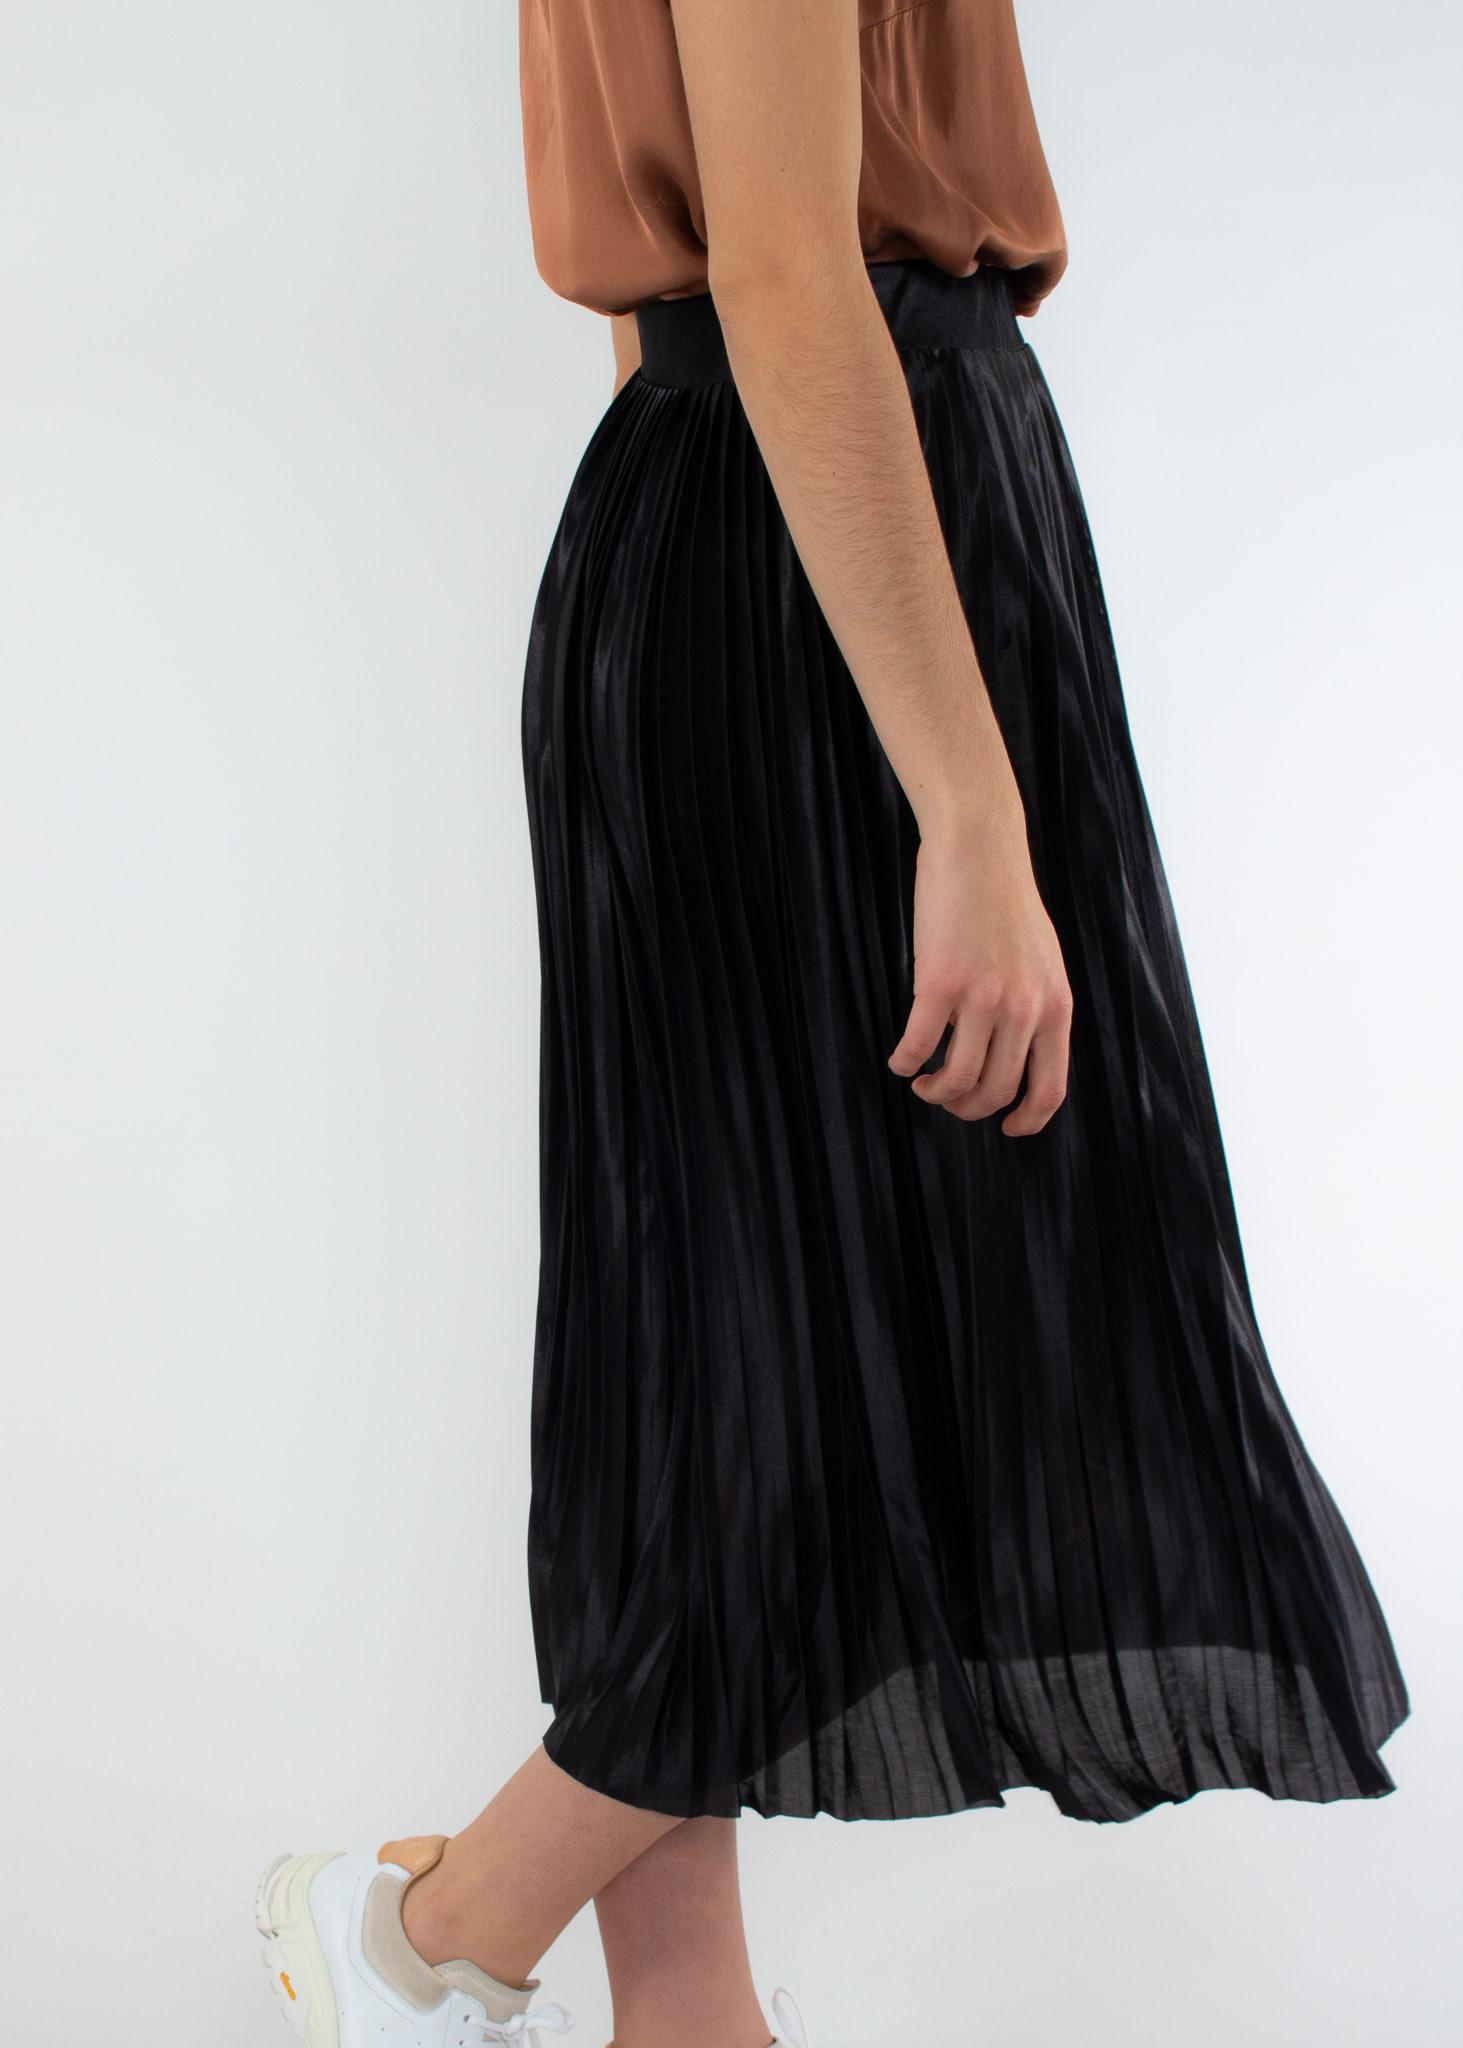 ICHI Pleat skirt black